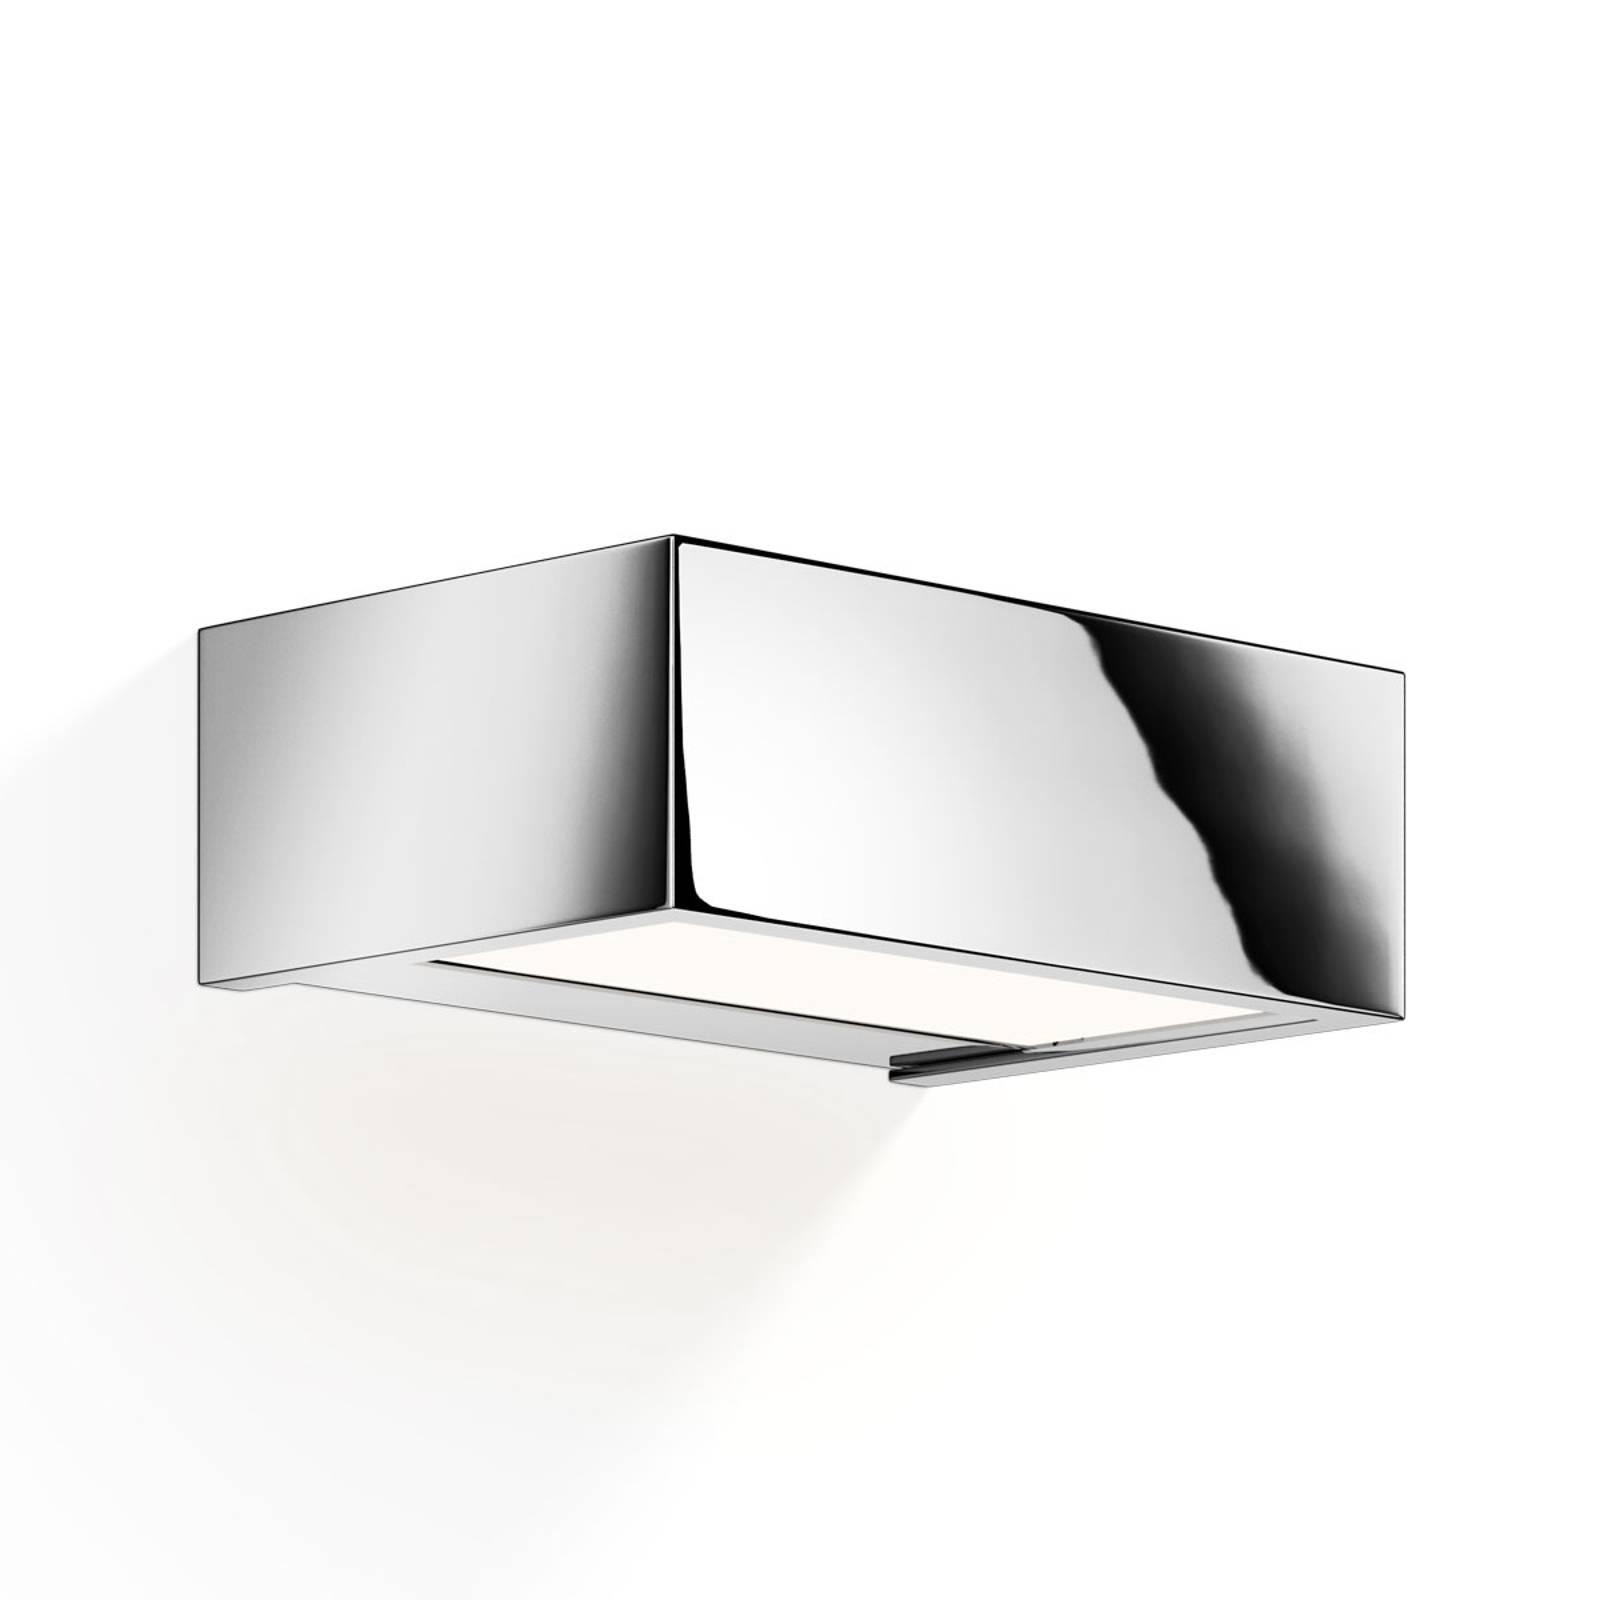 Decor Walther Box 15 N LED wandlamp 3.000 K